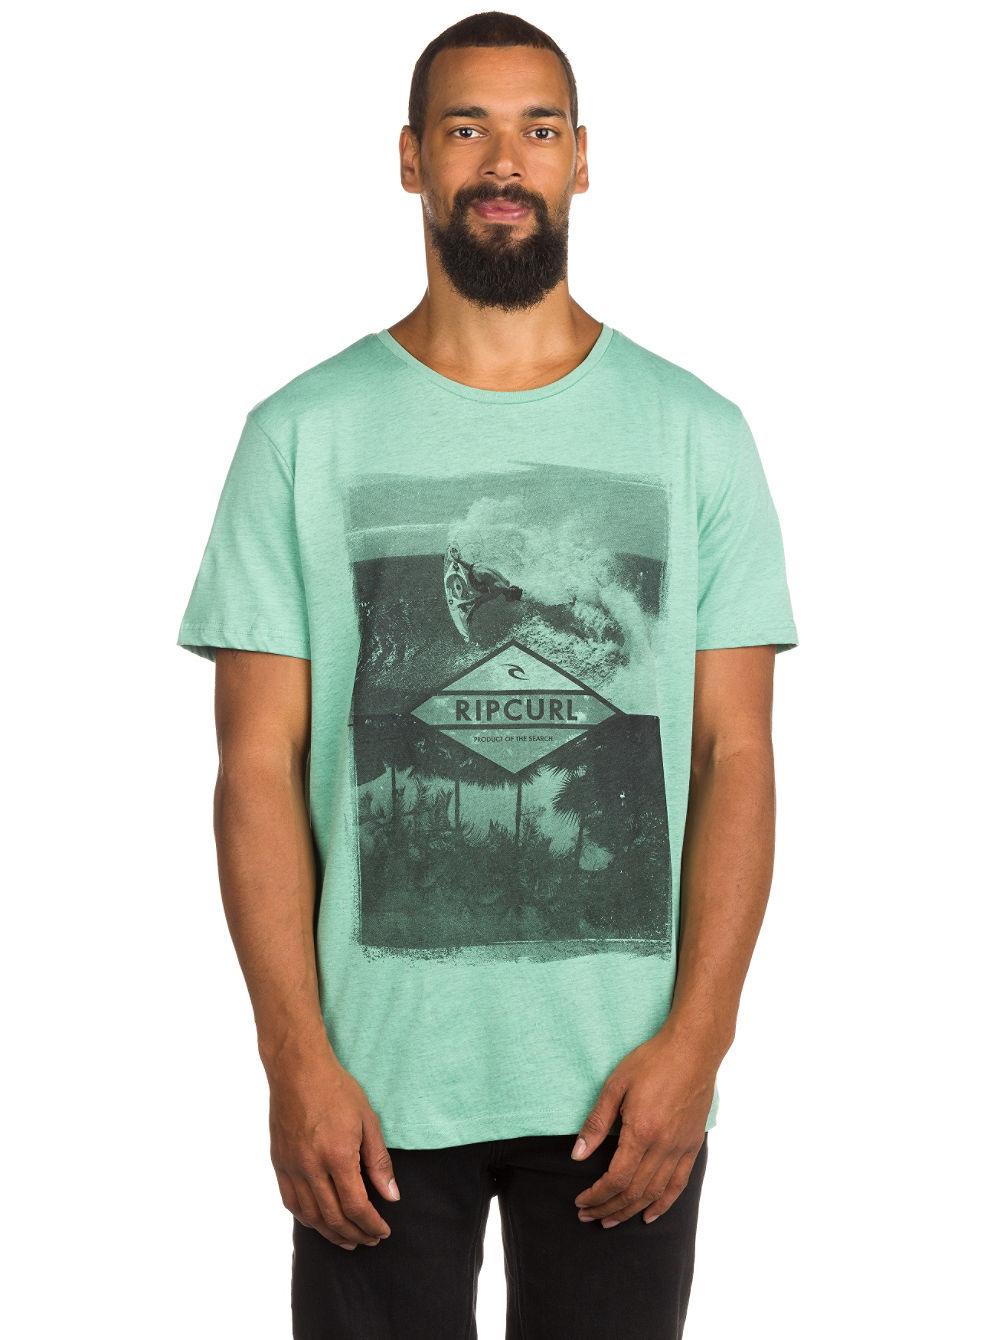 rip-curl-surfers-t-shirt